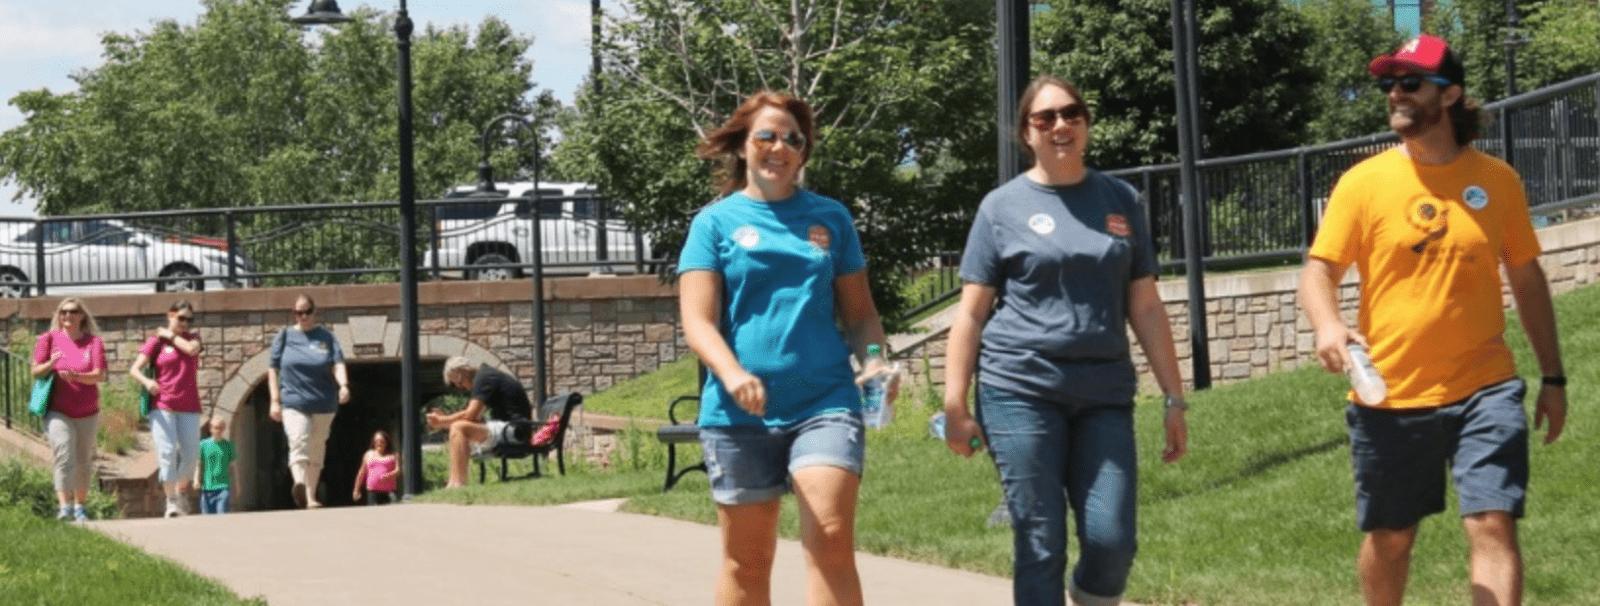 downtown eau claire wellness walk